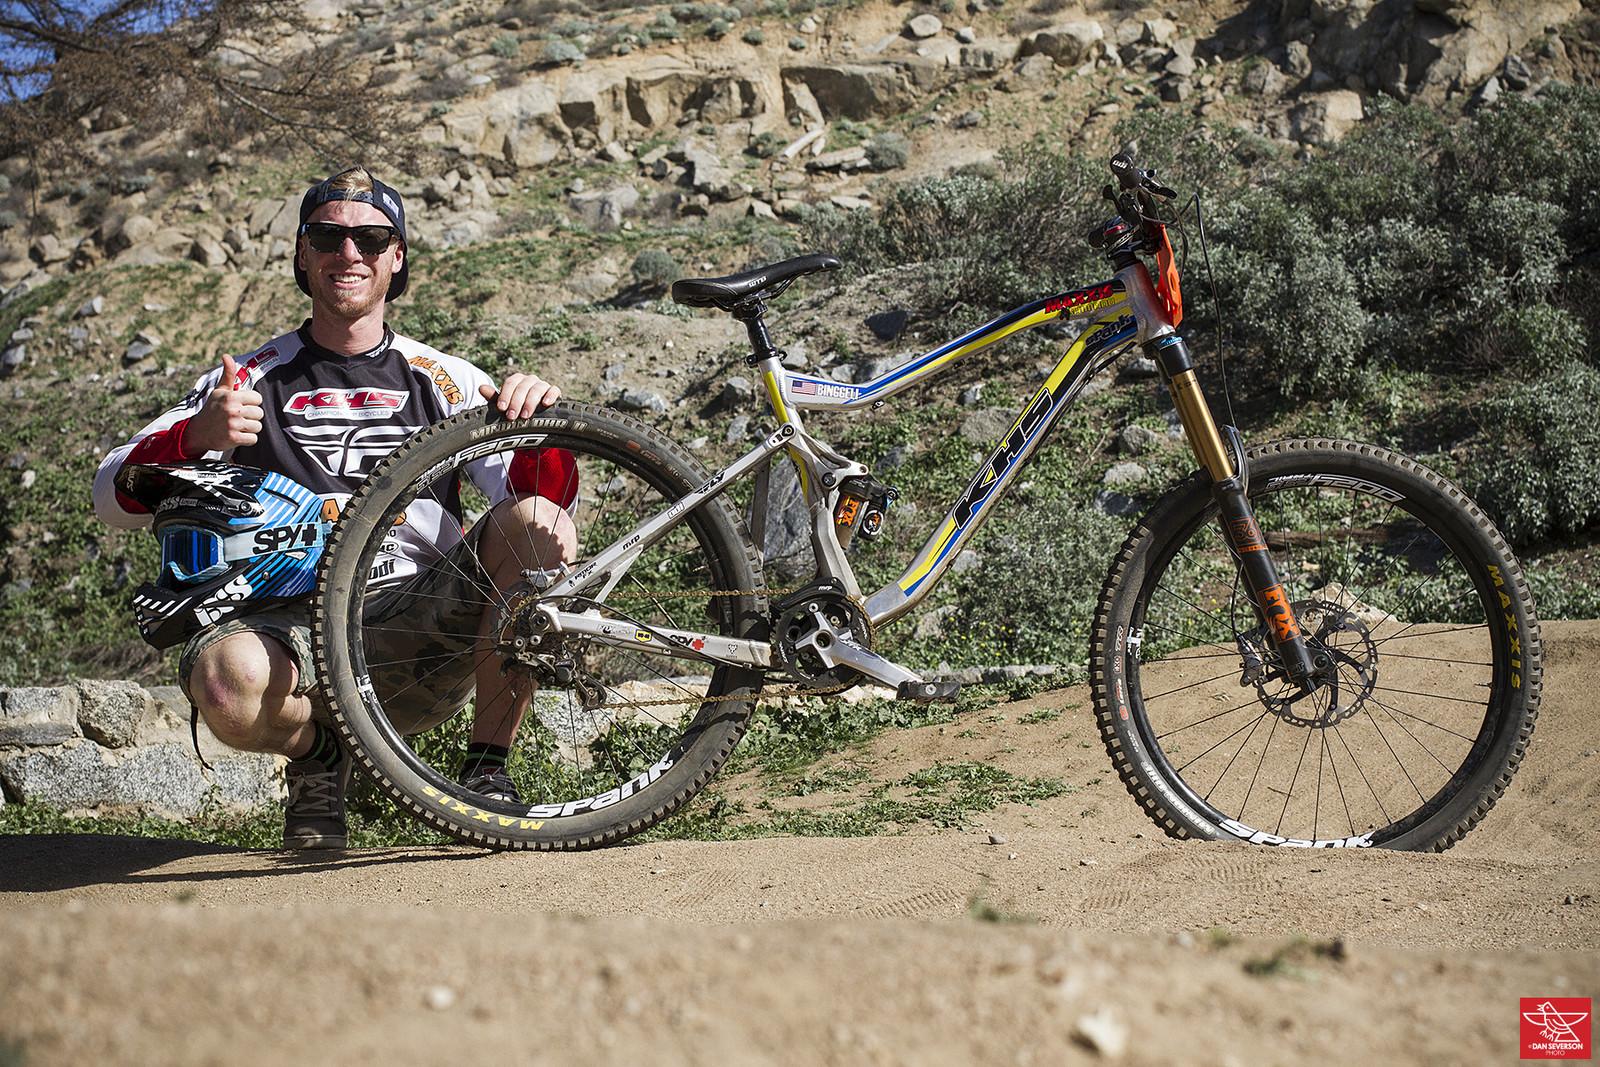 Pro Bike Check: Logan Binggeli's KHS 7500 - Pro Bike Check: Logan Binggeli's KHS 7500 - Mountain Biking Pictures - Vital MTB